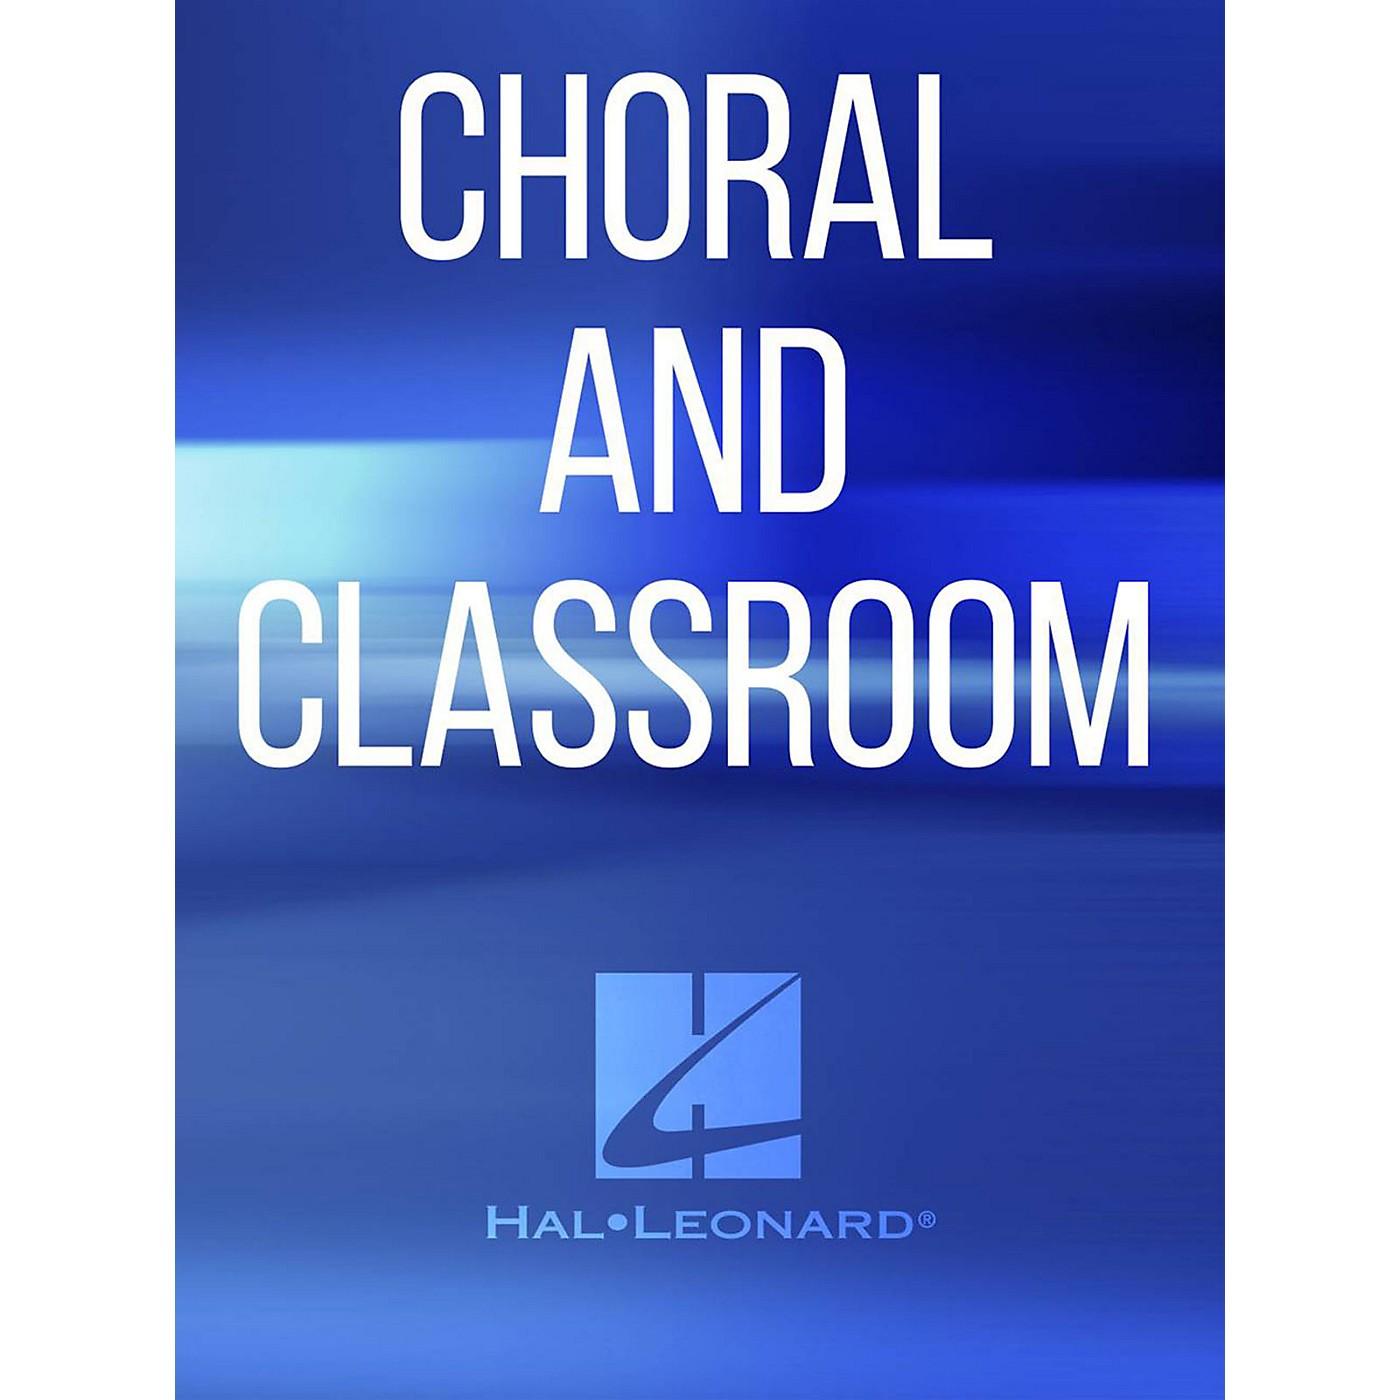 Hal Leonard Team ShowTrax CD by Lorde Arranged by Mac Huff thumbnail